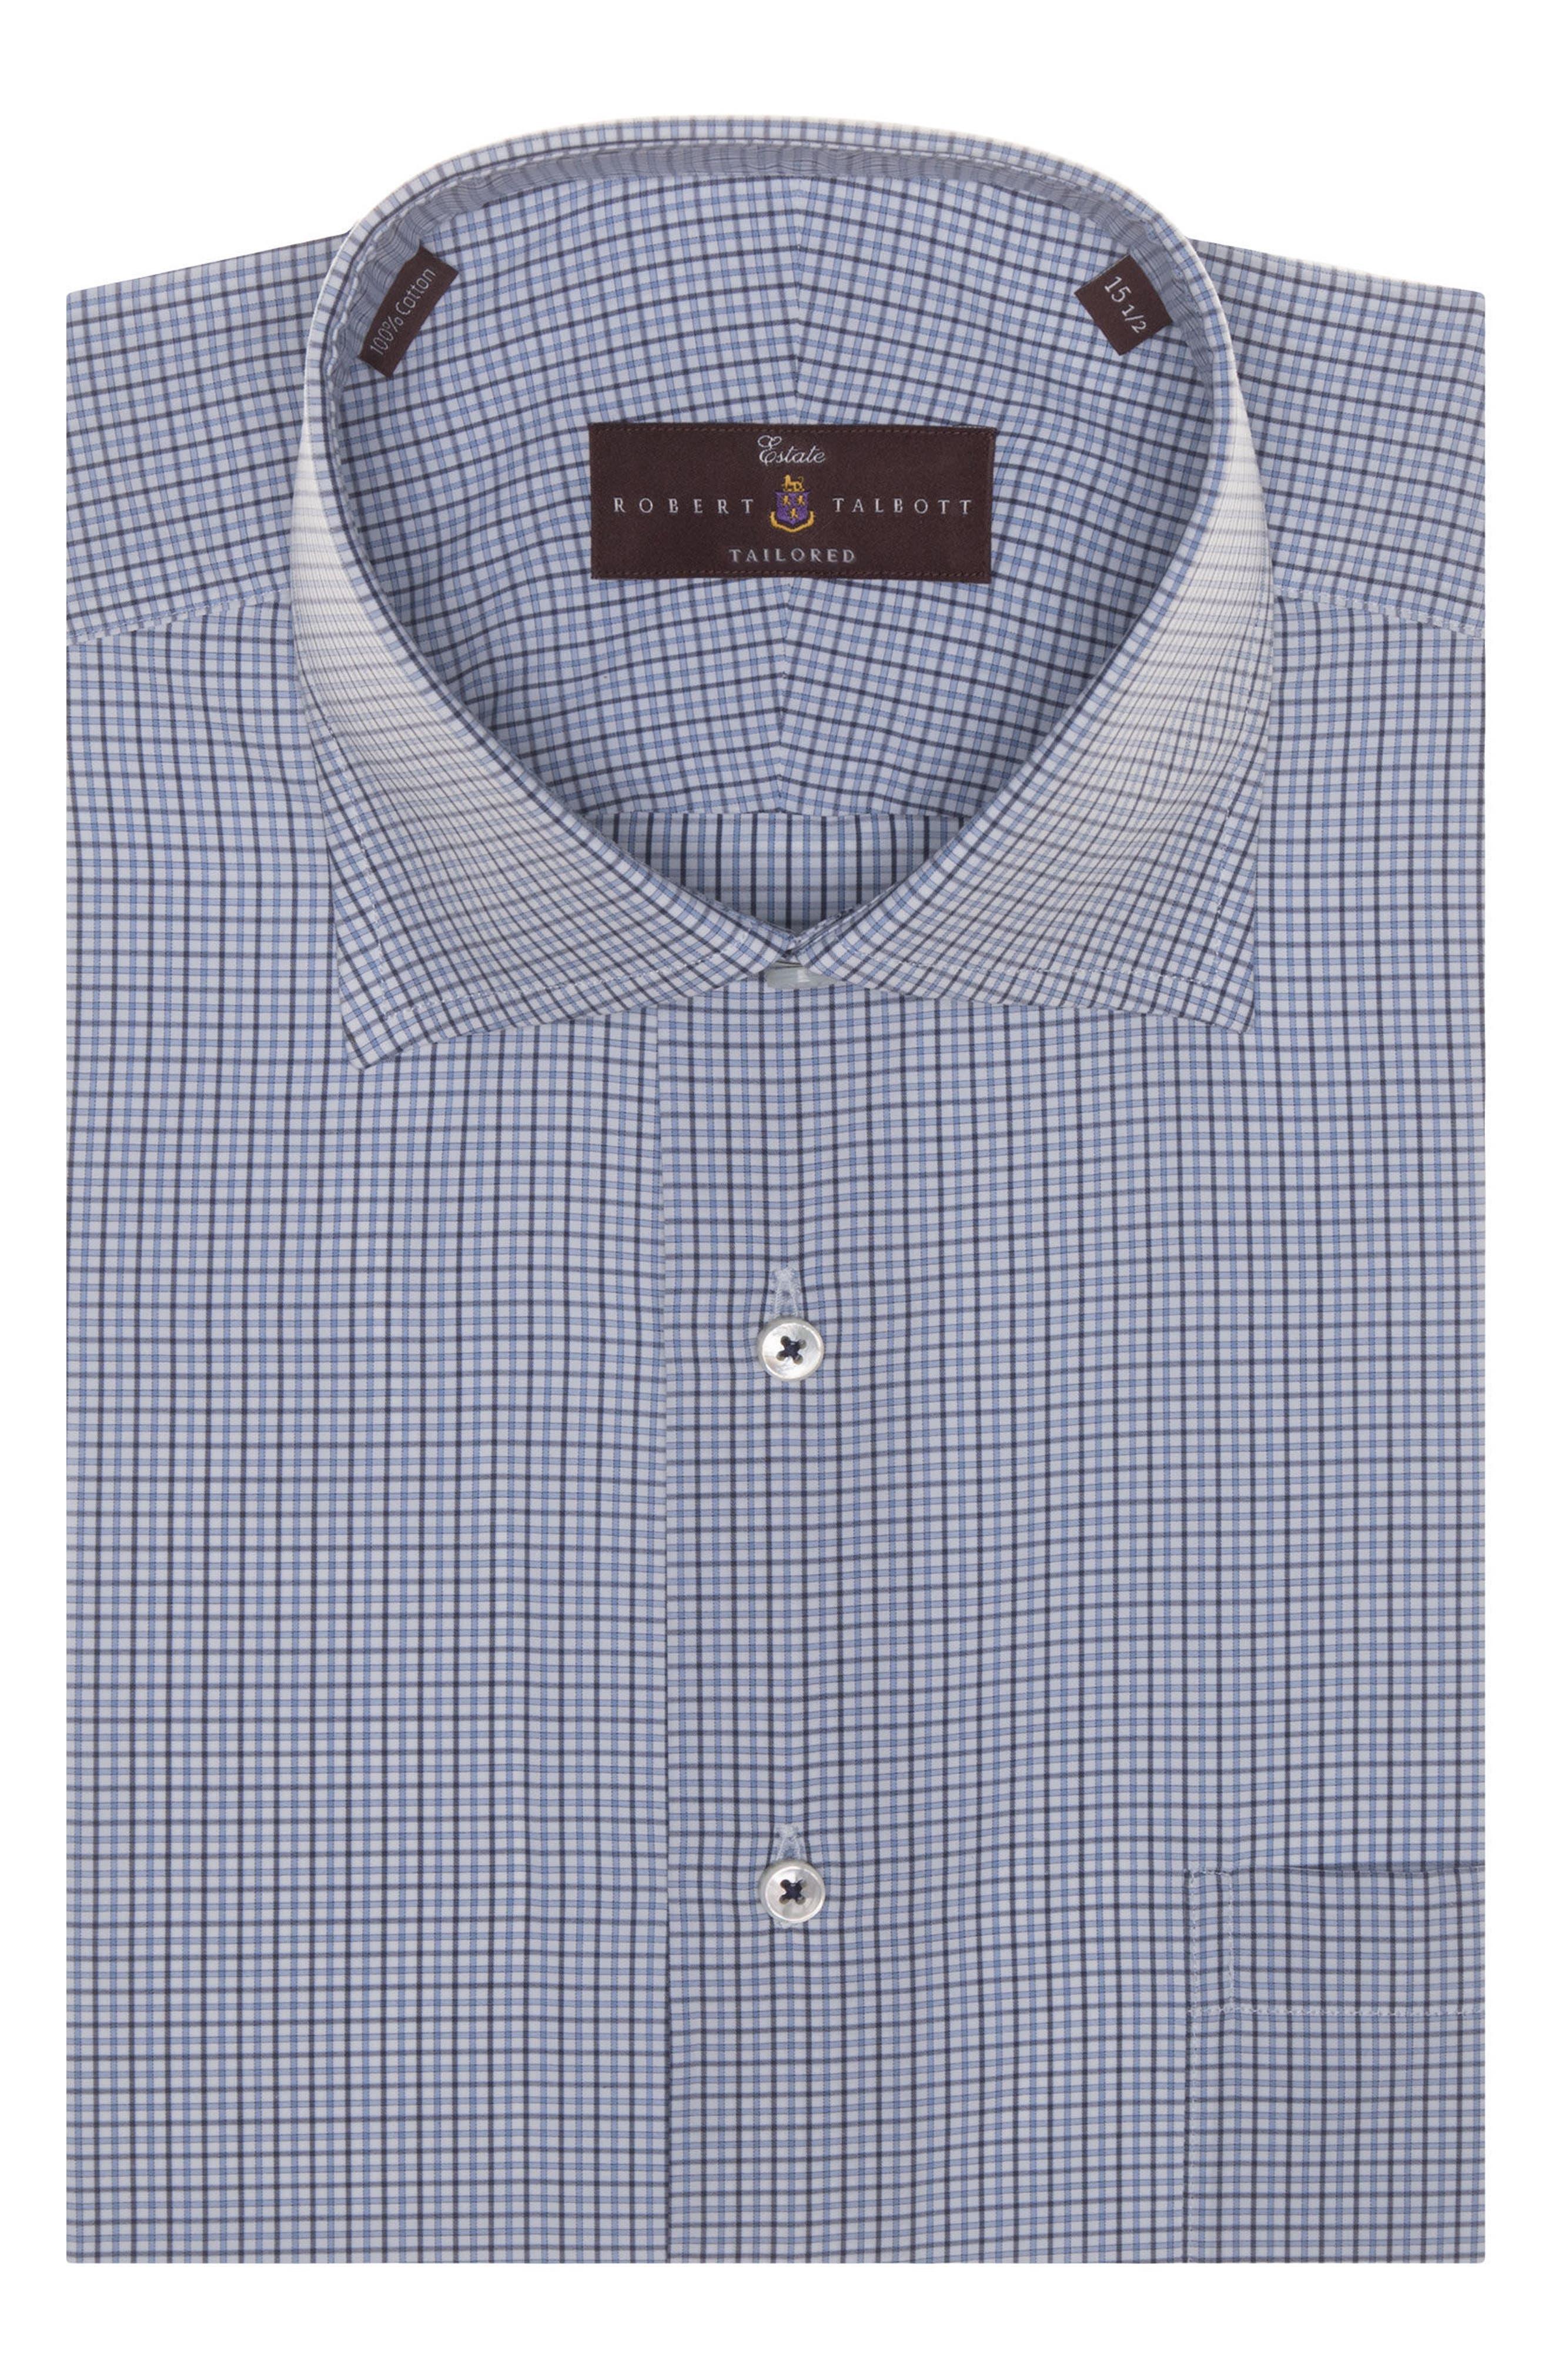 Tailored Fit Check Dress Shirt,                             Main thumbnail 1, color,                             401